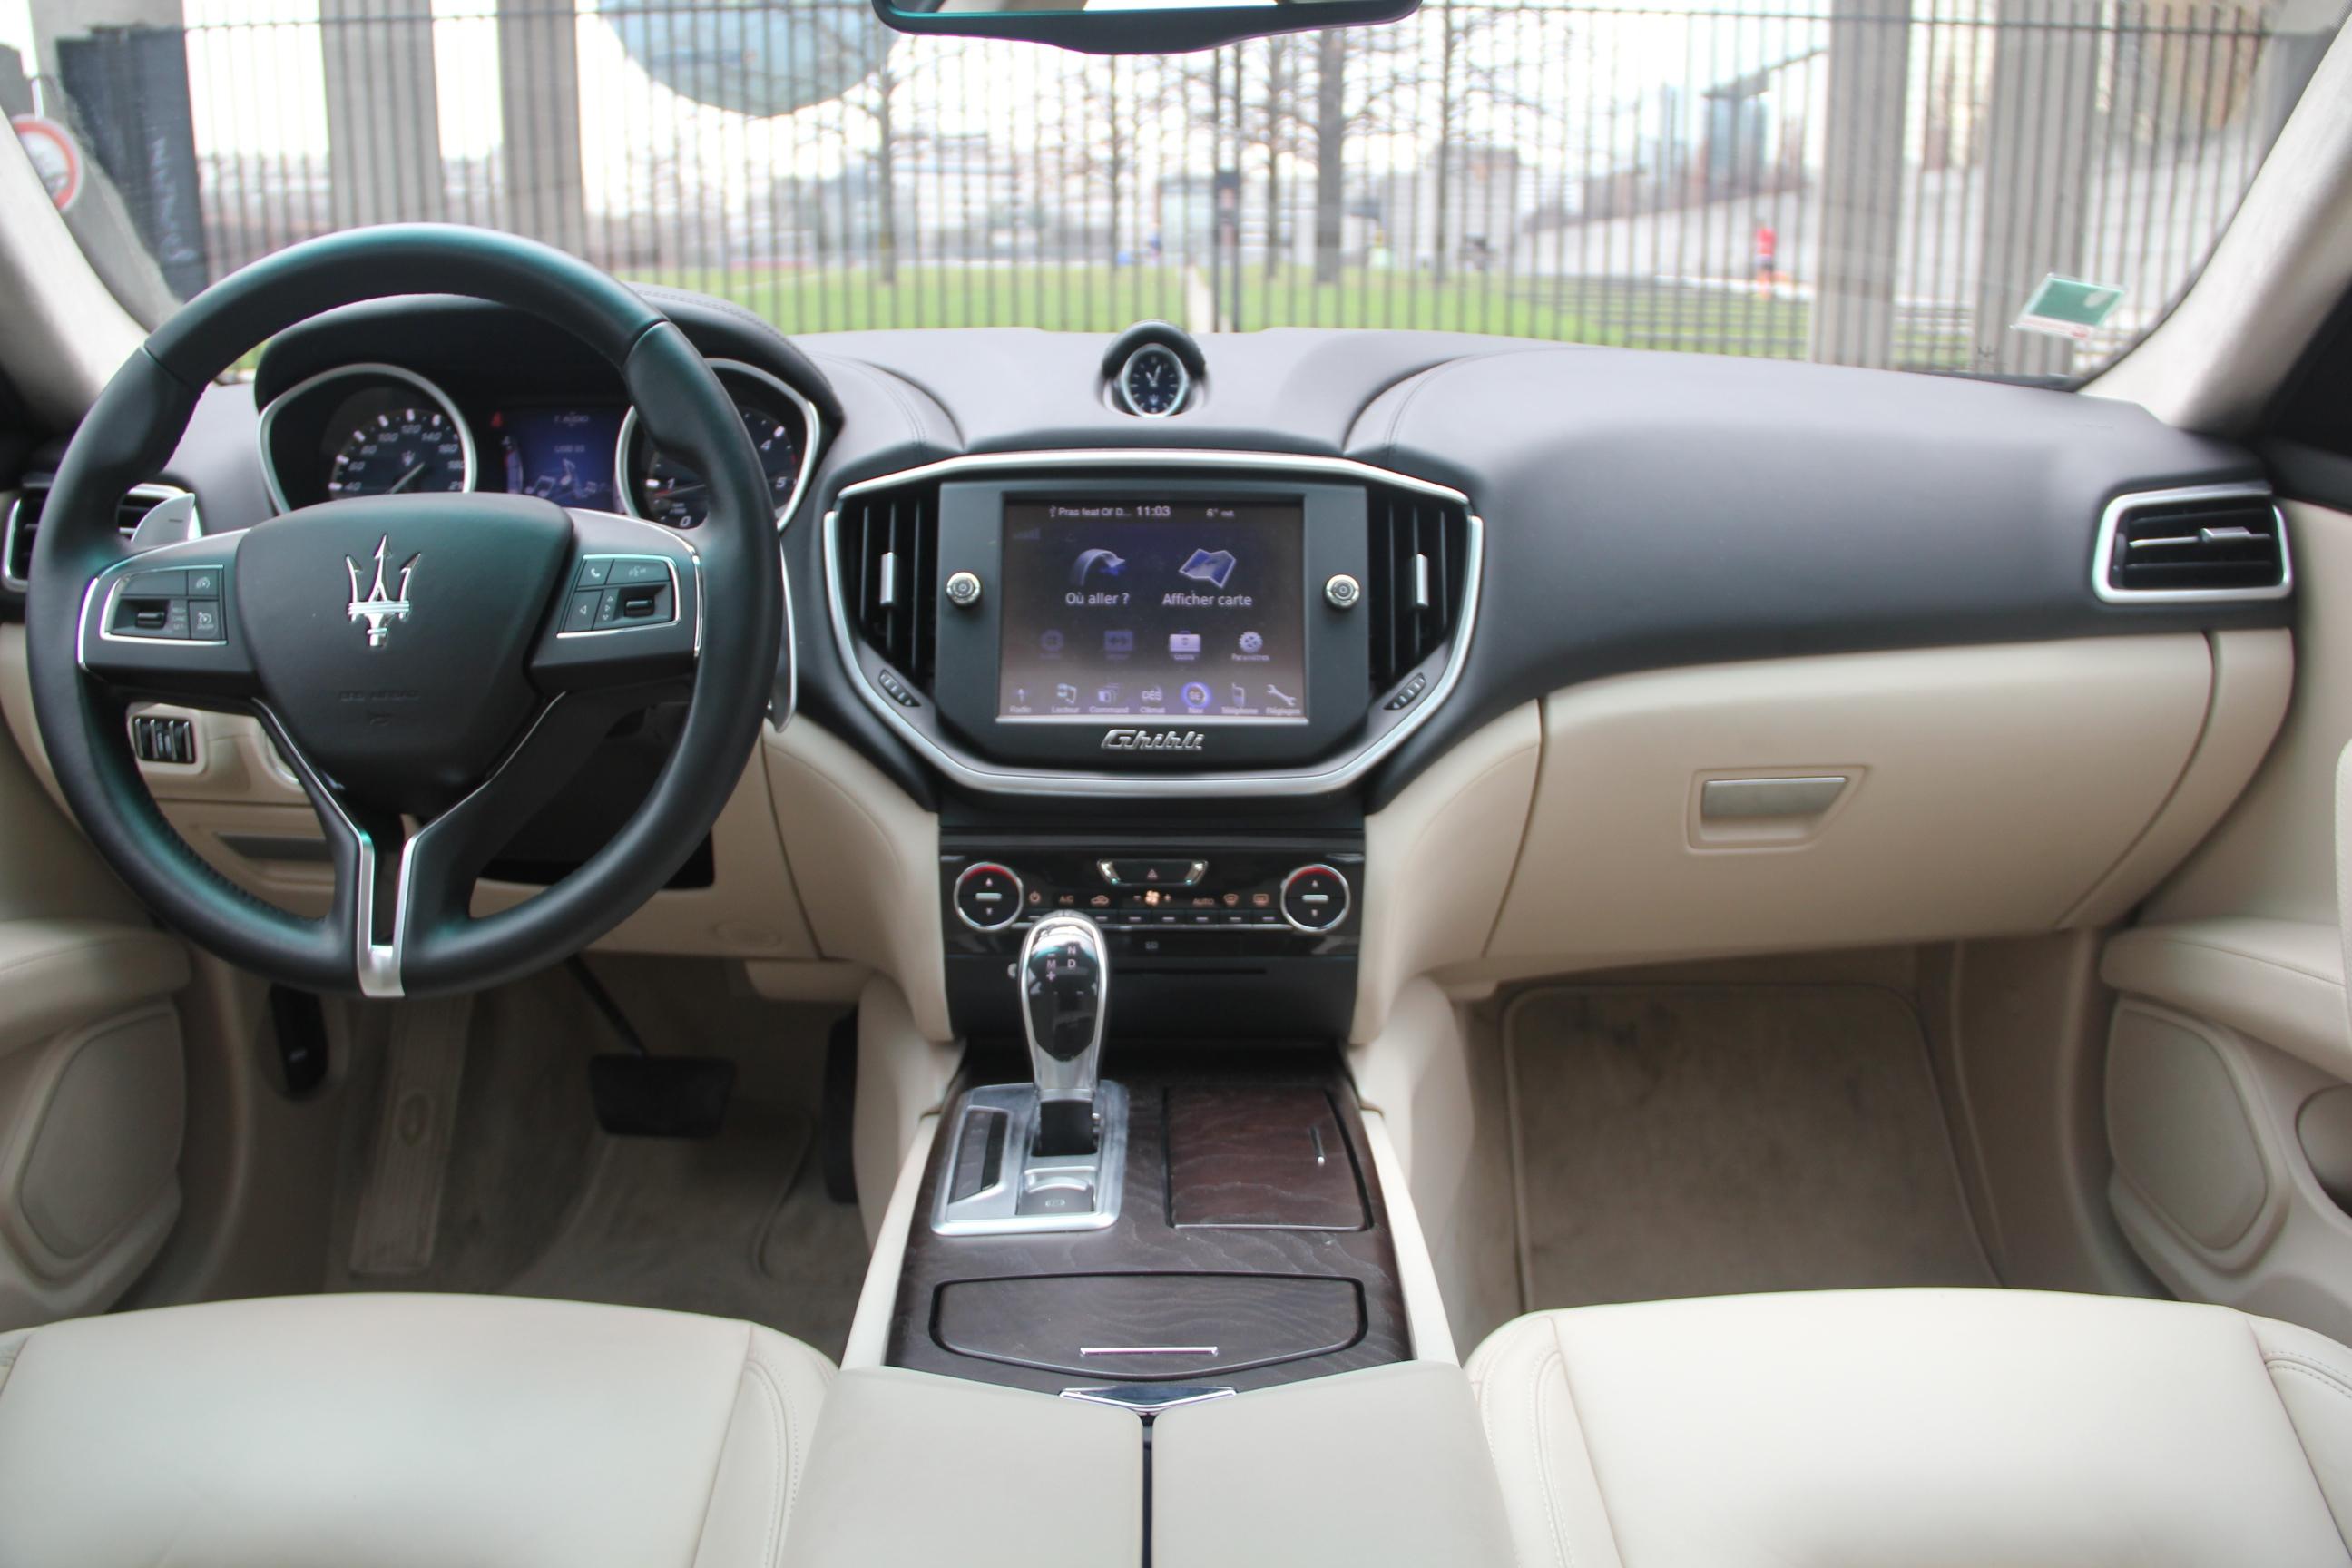 http://images.caradisiac.com/images/2/6/5/3/92653/S0-Essai-video-Maserati-Ghibli-arme-de-conquete-314367.jpg